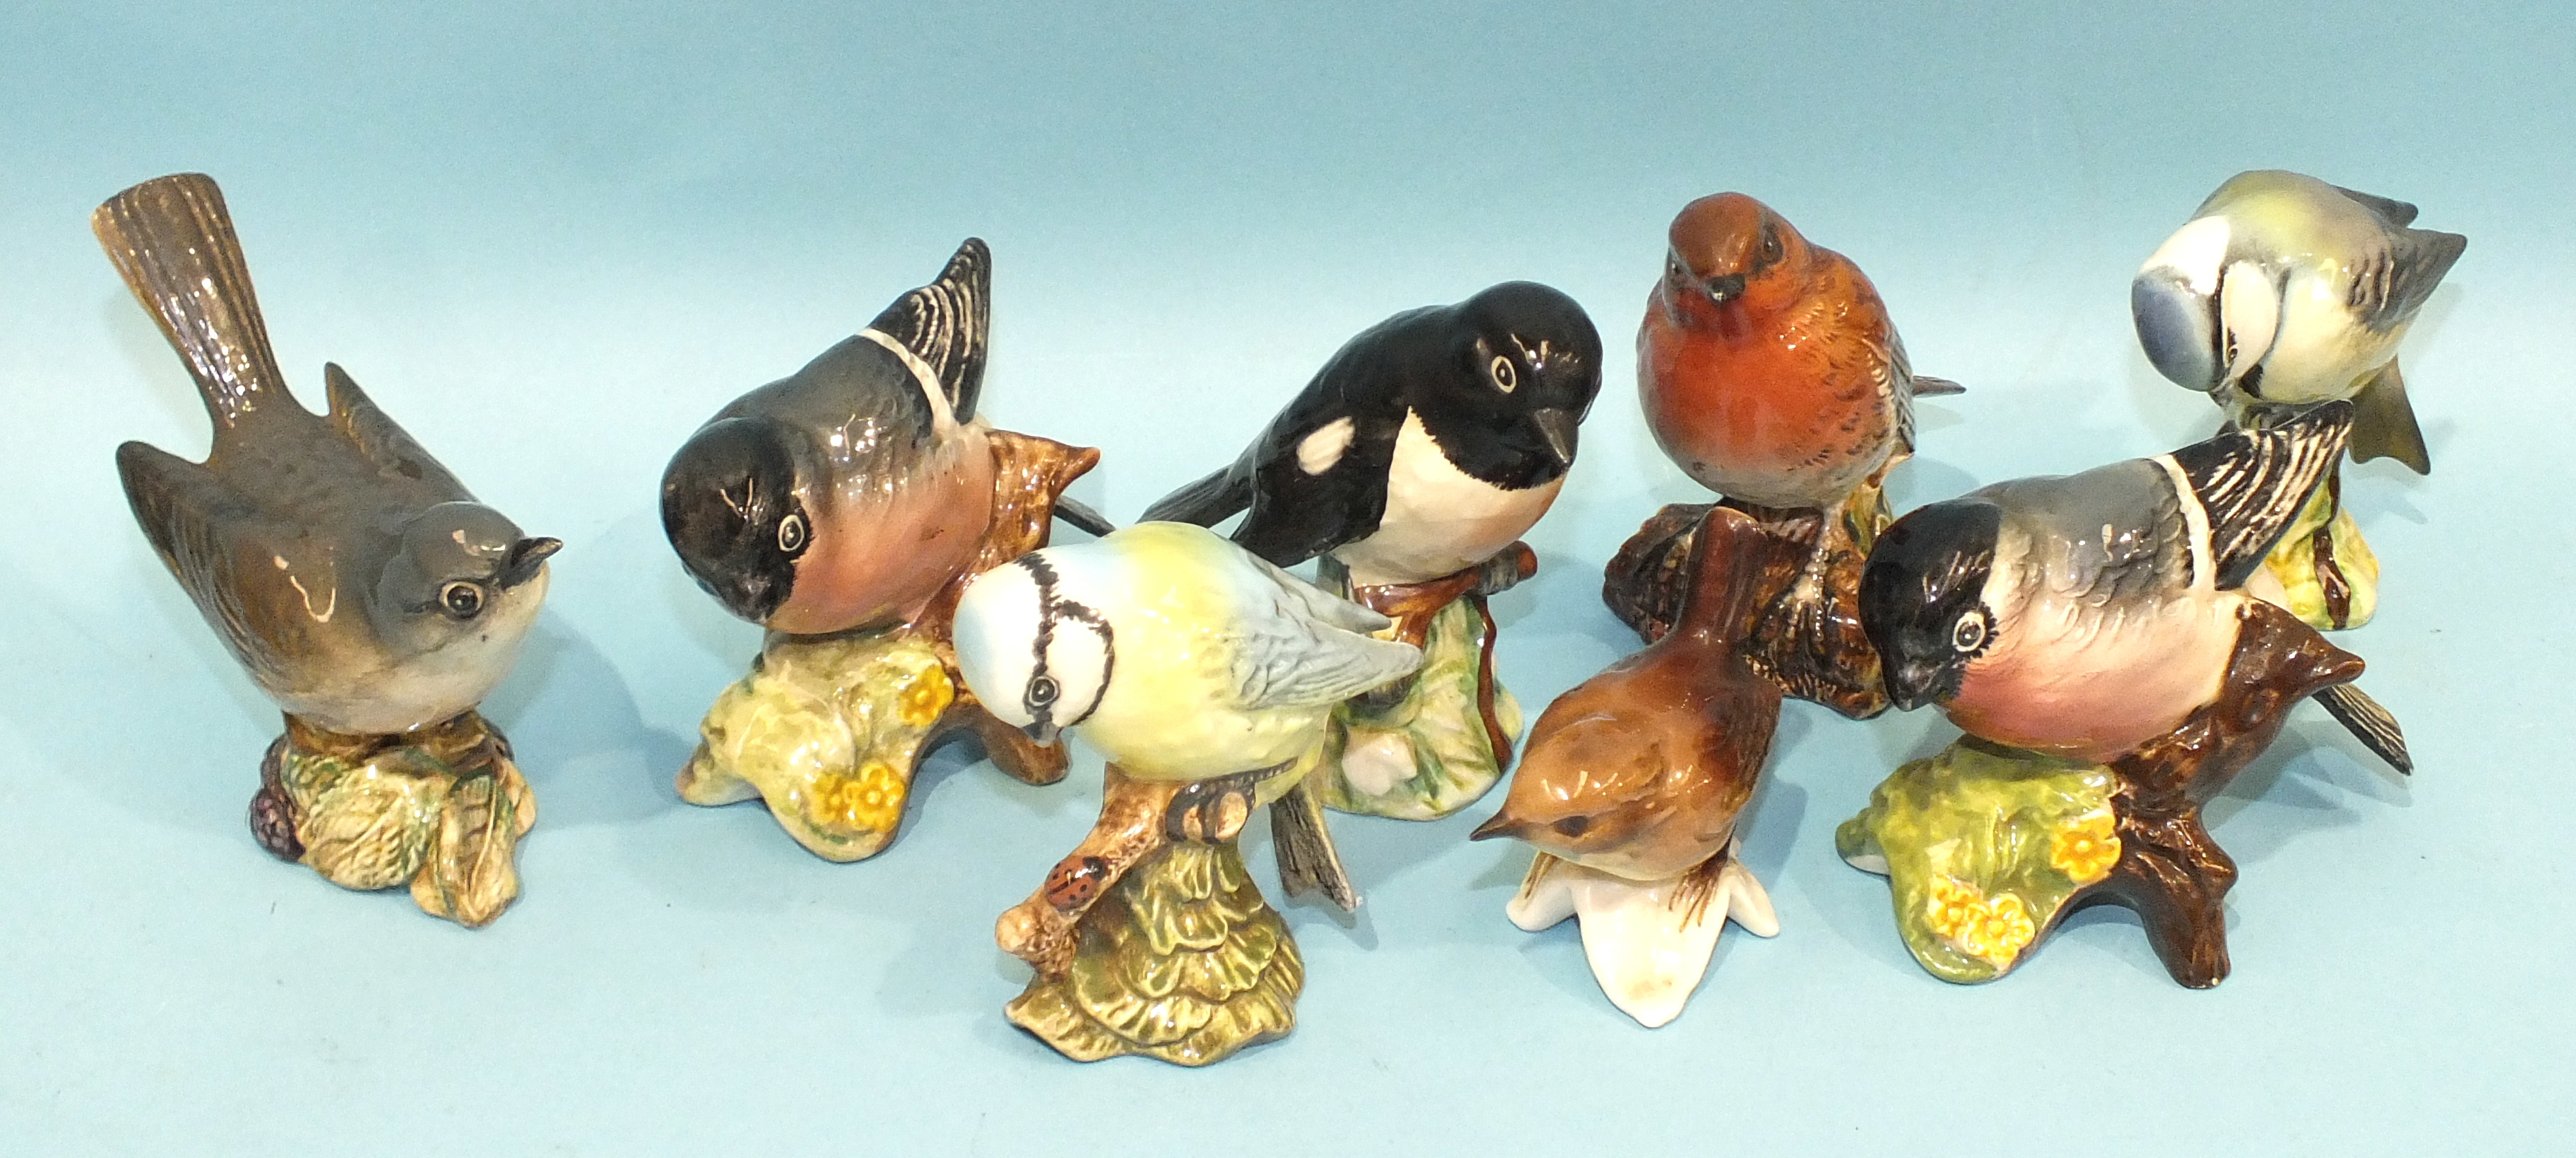 Lot 130 - A collection of seven Beswick small bird models: Whitethroat, Bullfinch (x2), Blue Tit (x2),